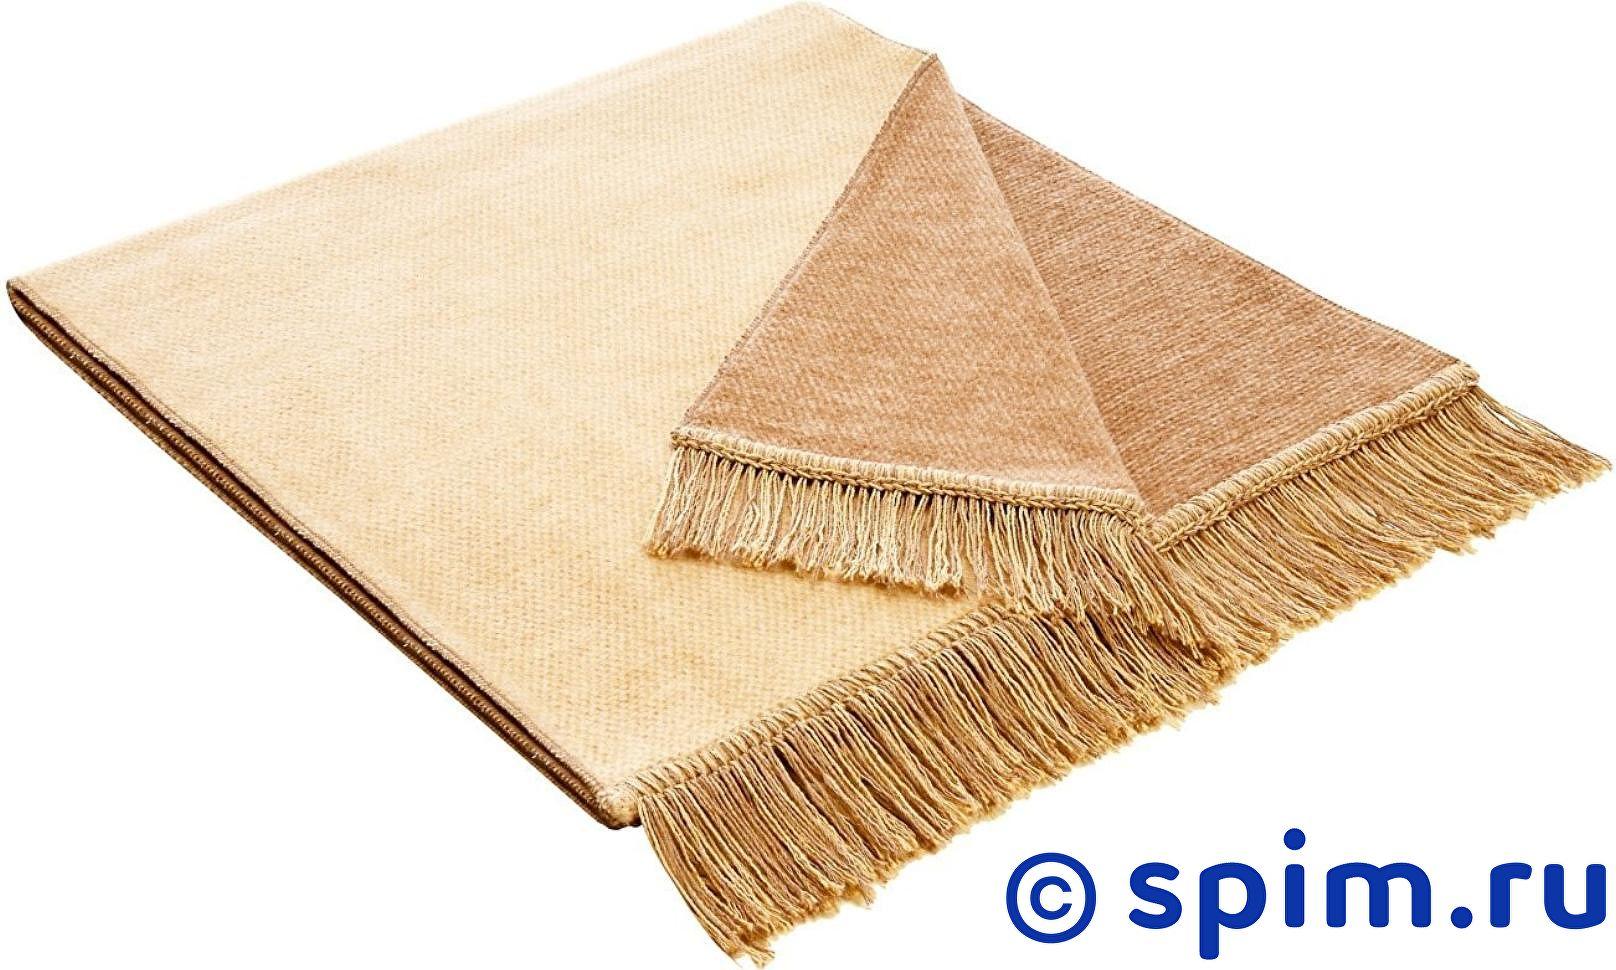 Купить со скидкой Плед Biederlack Cover Cotton S&P 100х200 см 100х200 см